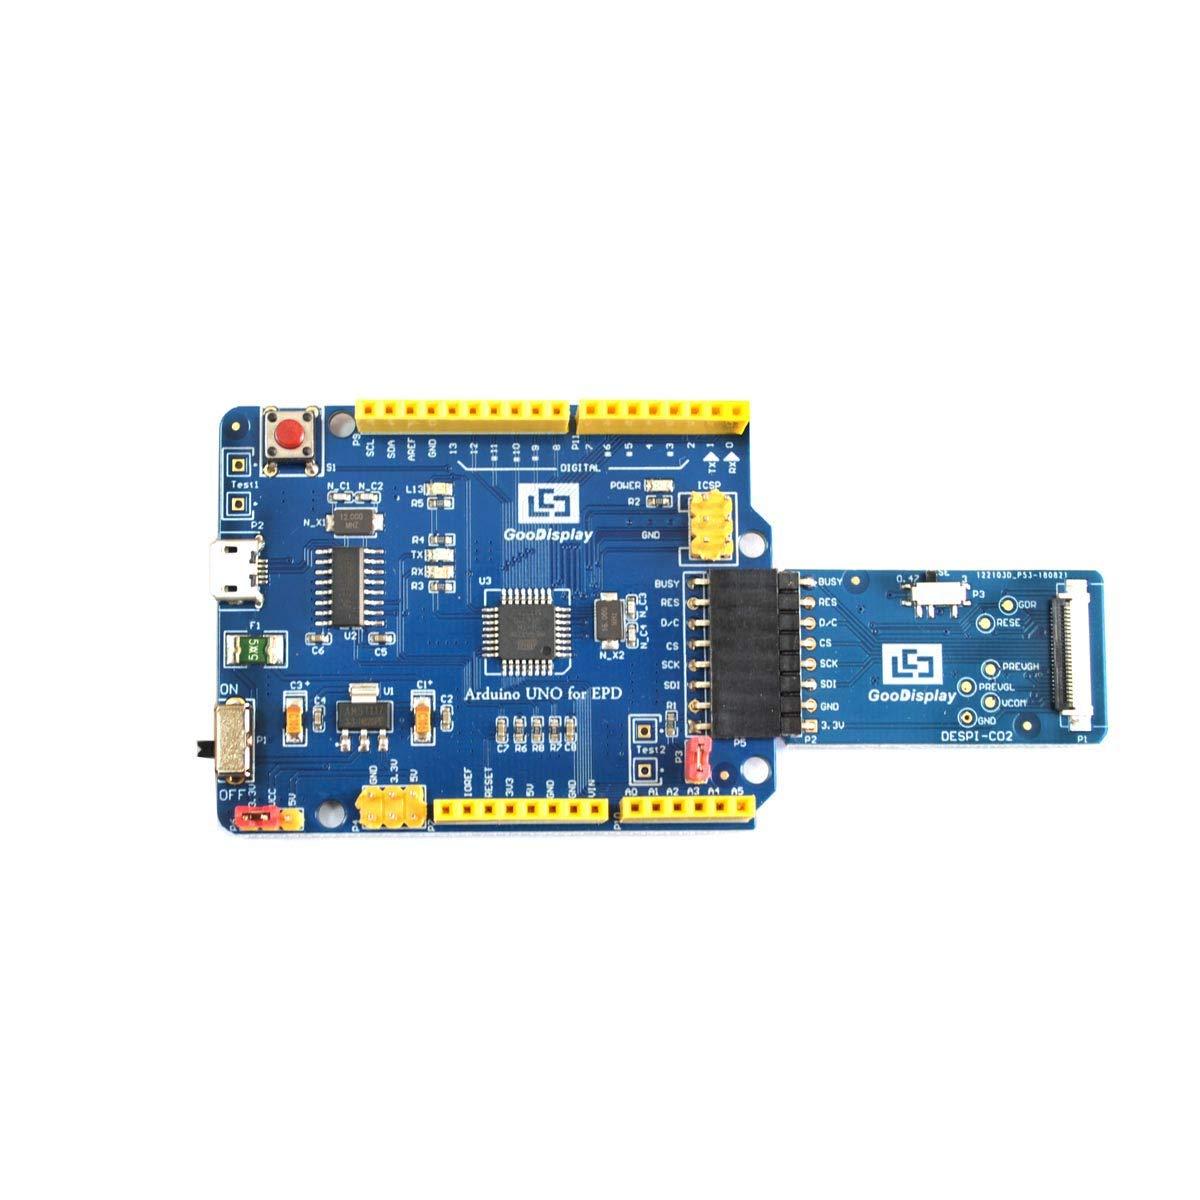 GooDisplay Arduino UNO for EPD Demo Kit Adapter USB Input Communication Development Board Driver HAT for E-Ink Module DEArduino